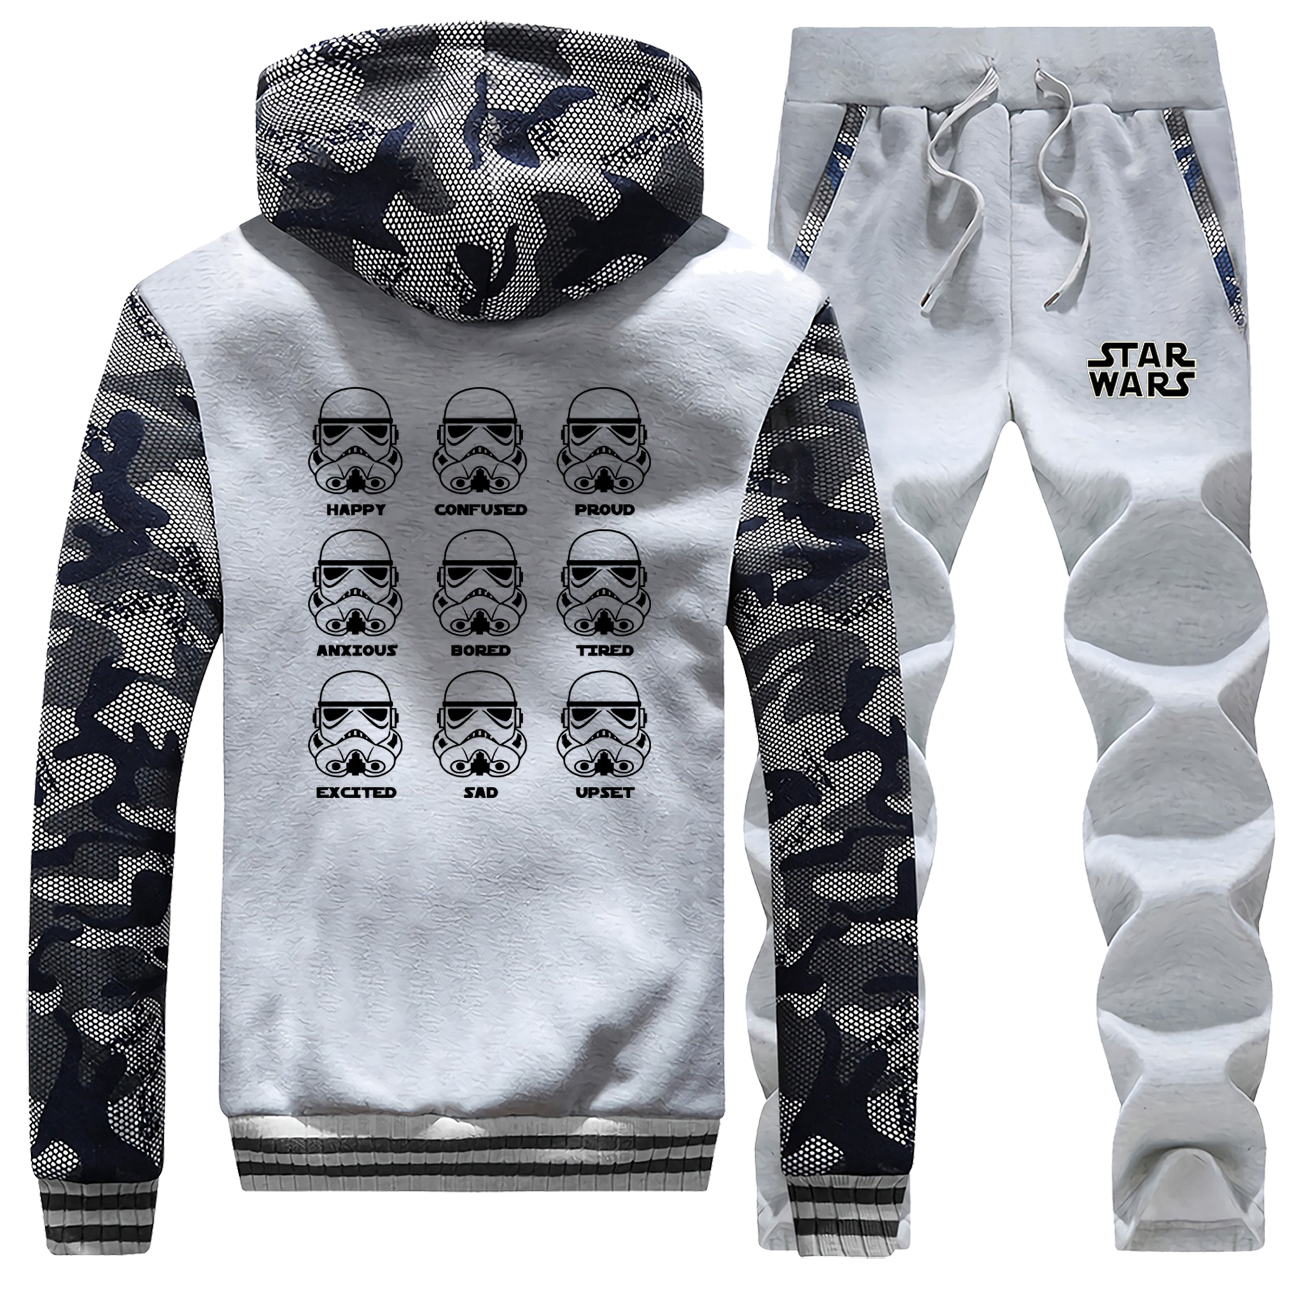 Star Wars Hoodie Darth Vader Pant Set Men Tracksuit Coat Selfie Stormtrooper Galictic Empire Winter Thick Jacket Camo 2 PCS Sets